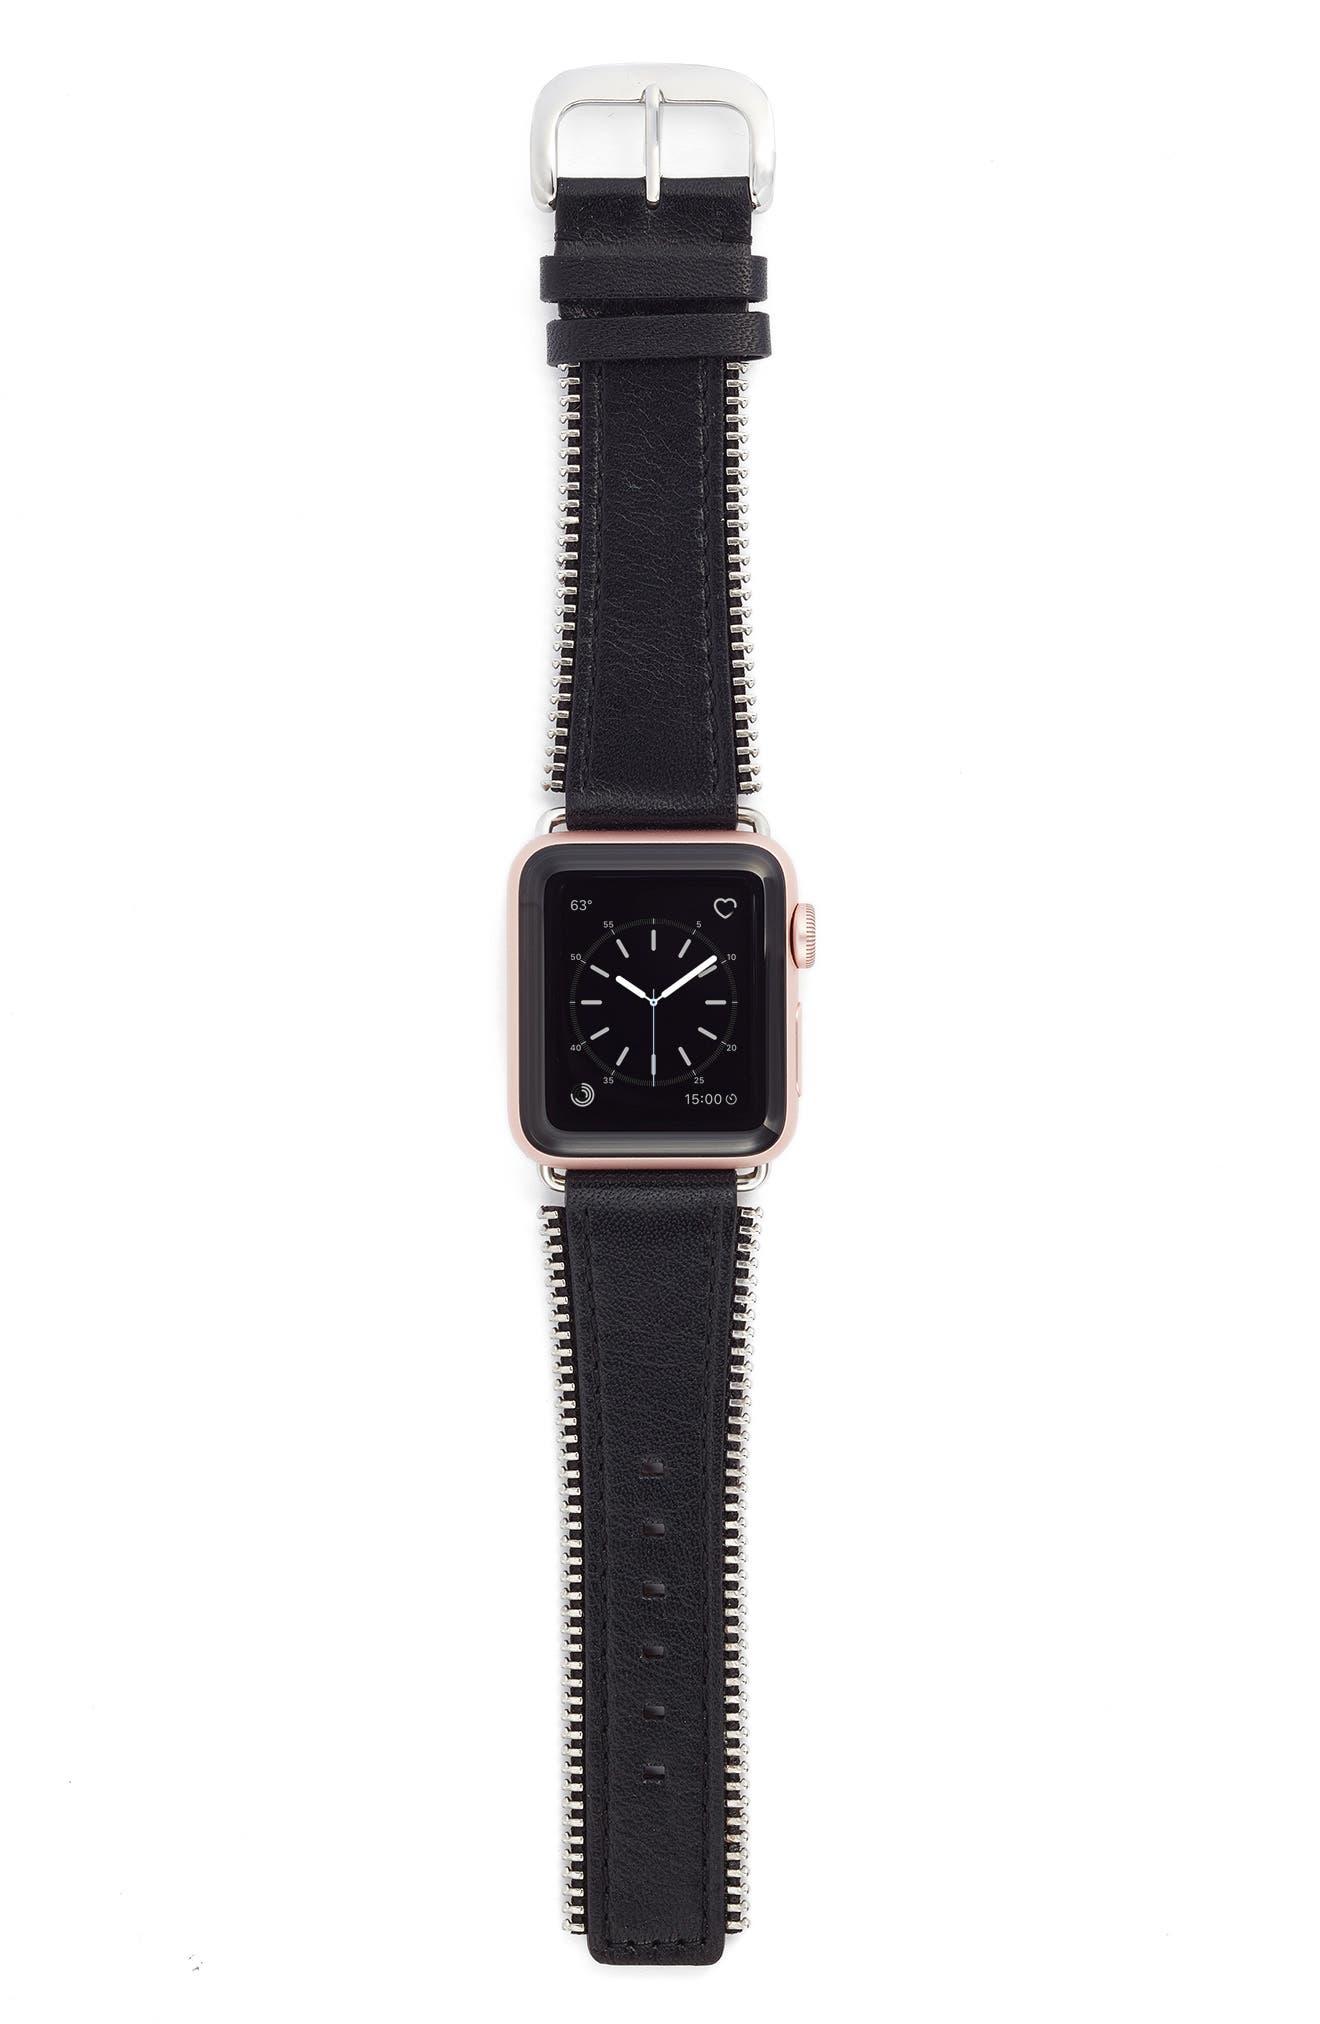 Main Image - Bezels & Bytes Zip Teeth Leather Apple Watch Strap, 38mm